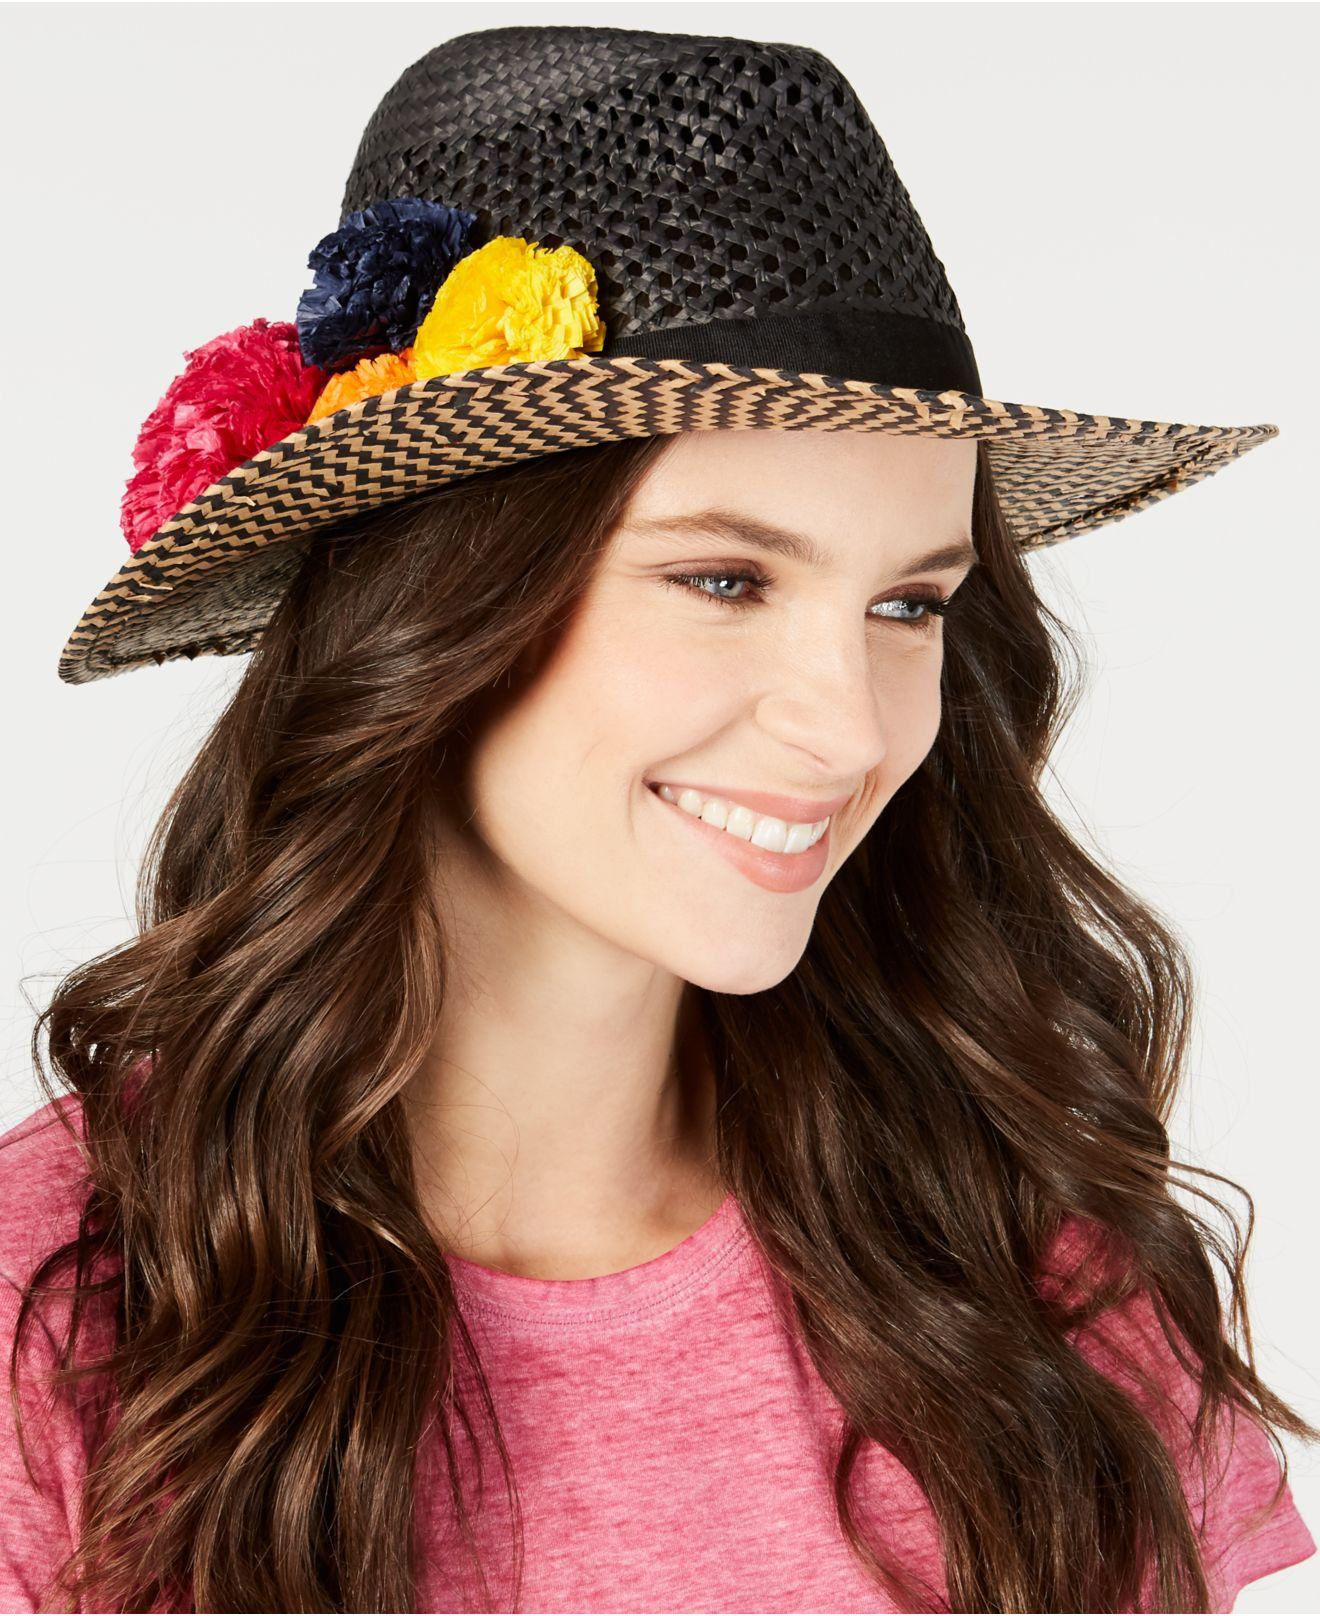 580b04f417018 Lyst - Betsey Johnson Pom Pom Panama Hat in Black